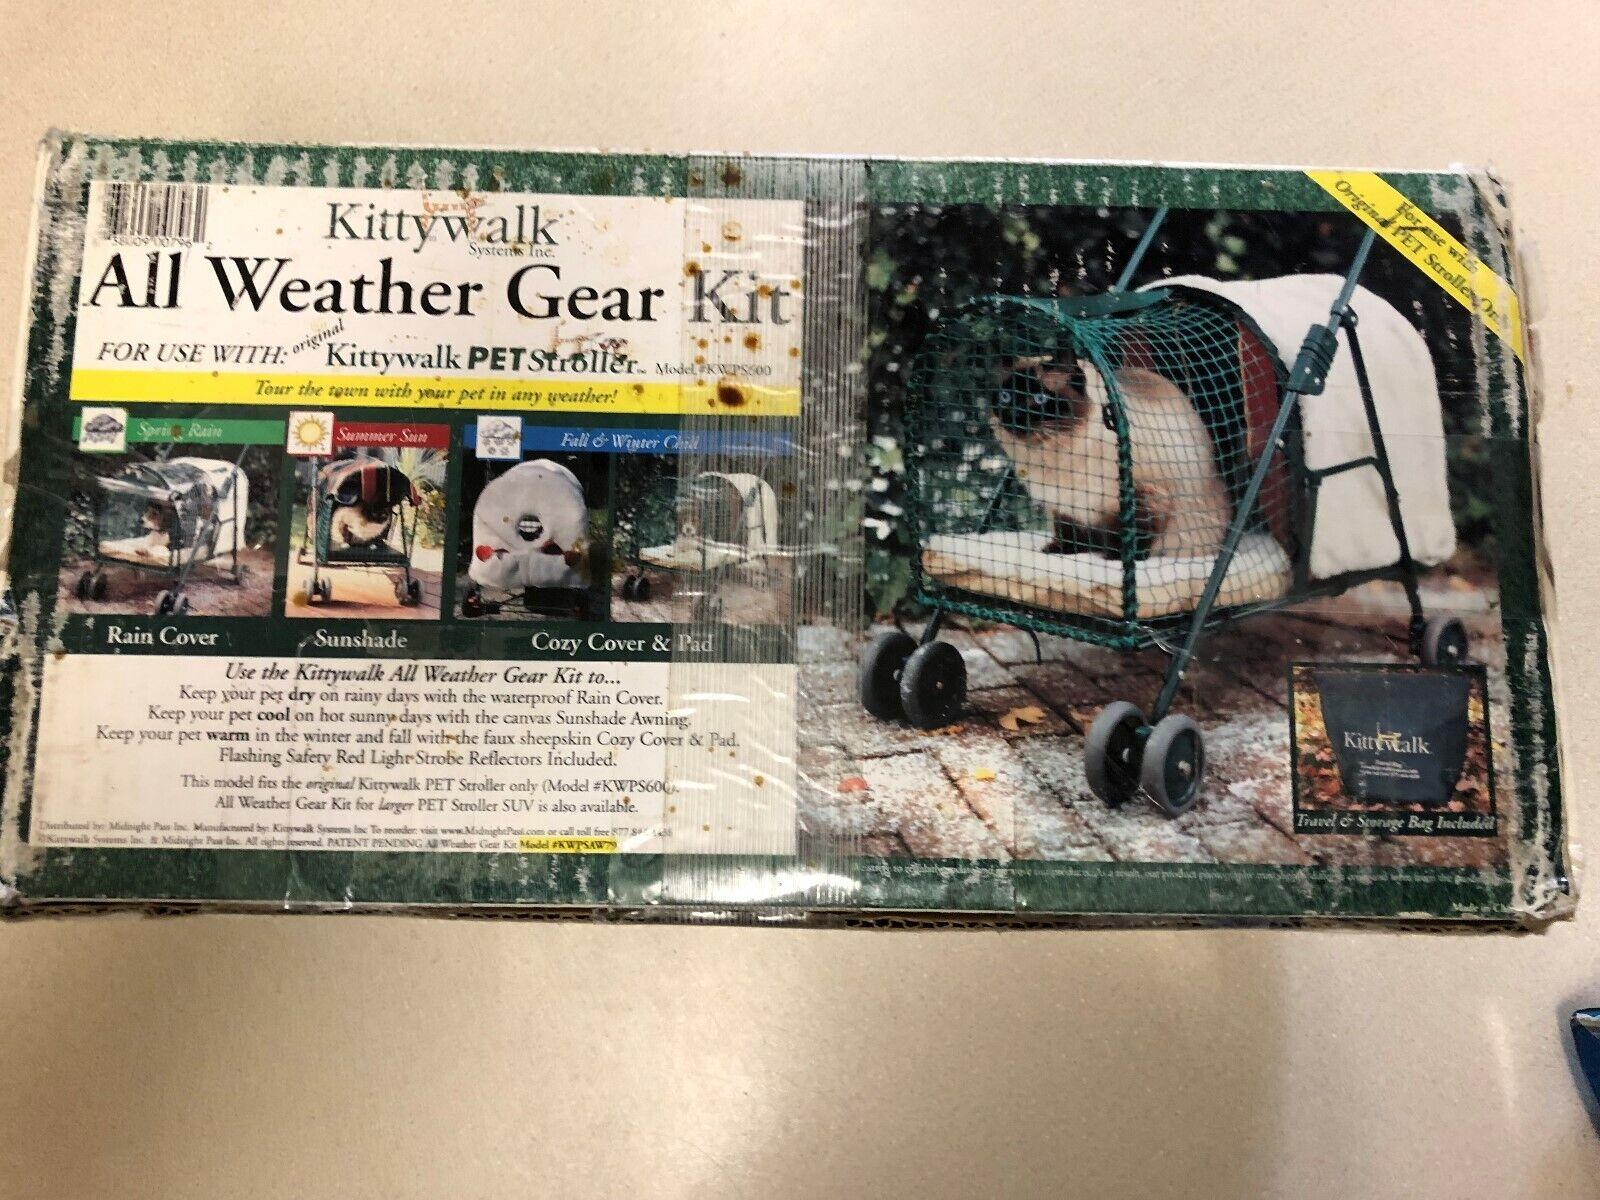 Kittywalk All Weather Gear Kit for Pet Stroller